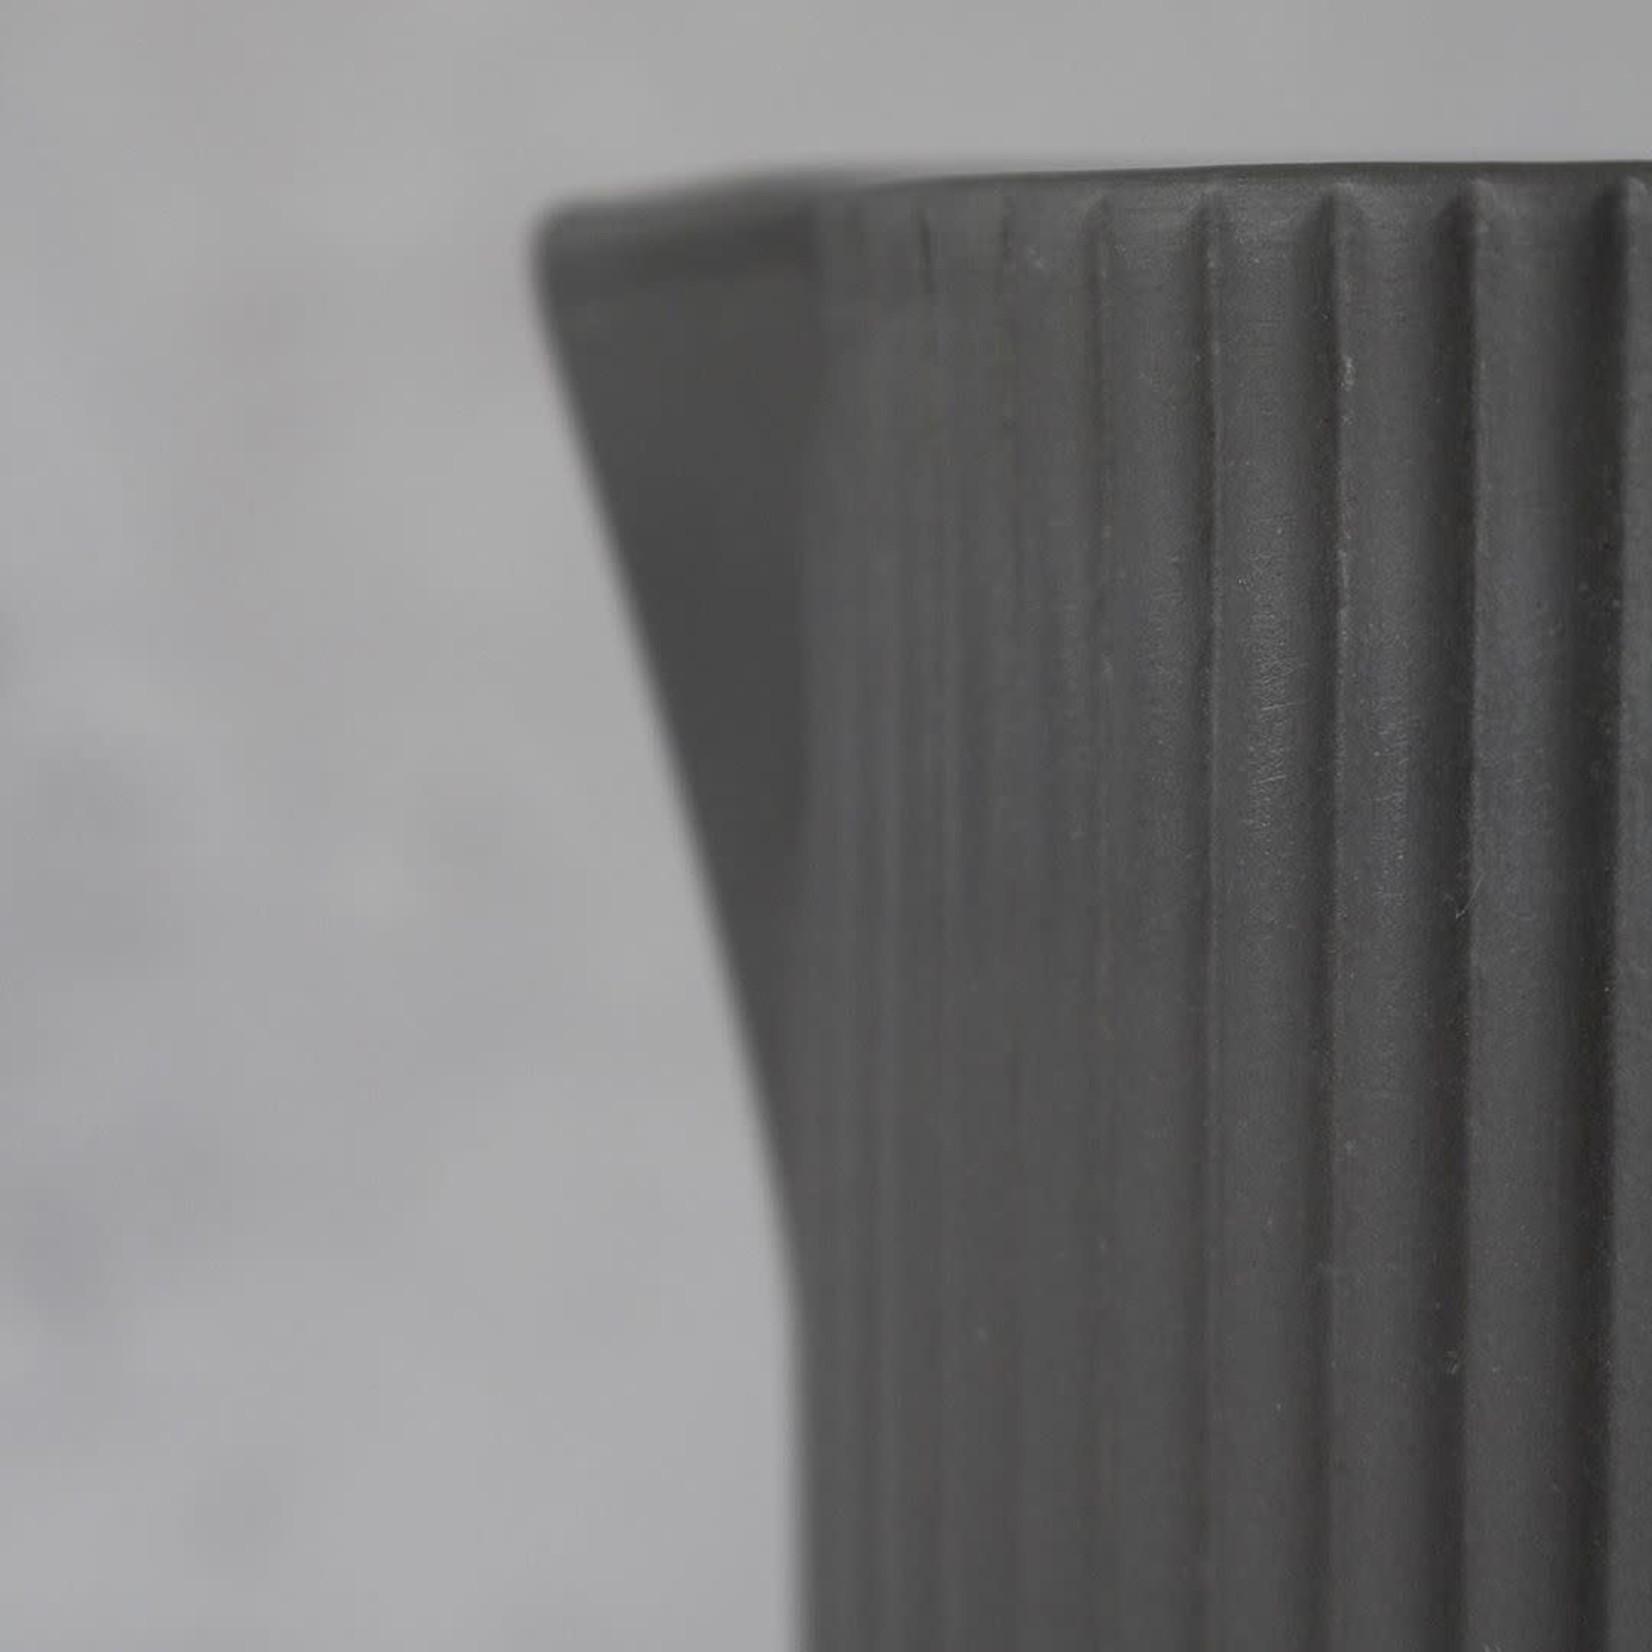 Archive Studio Archive Studio Handmade Water Jug Ribbed Dark Grey